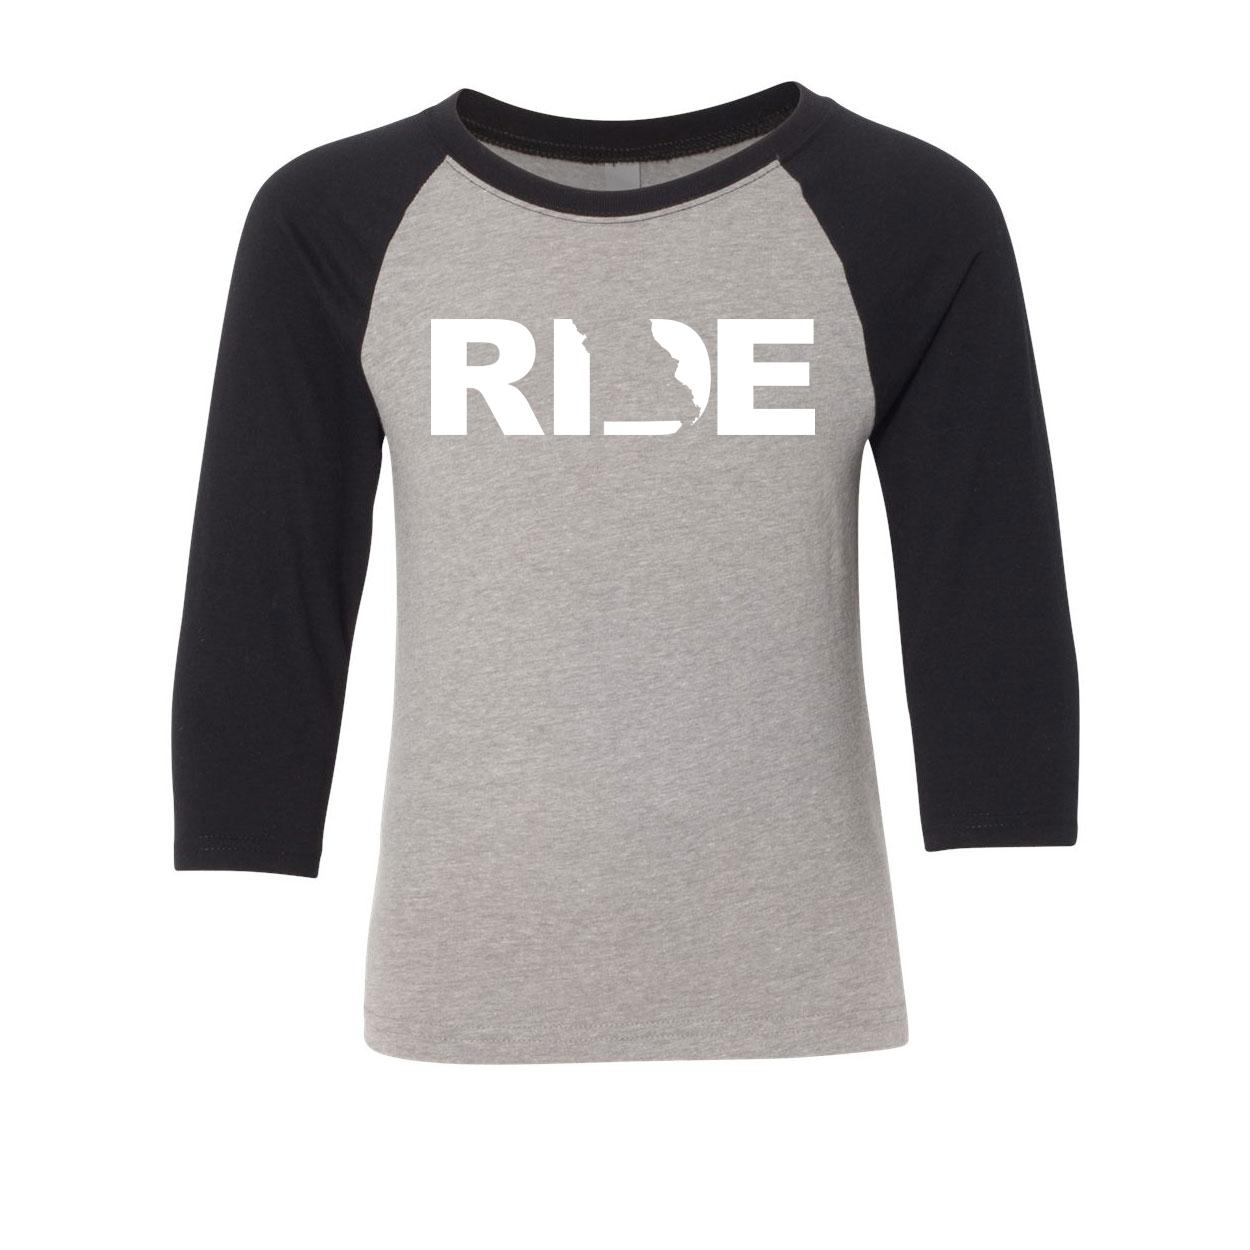 Ride Missouri Classic Youth Premium Raglan Shirt Gray/Black (White Logo)